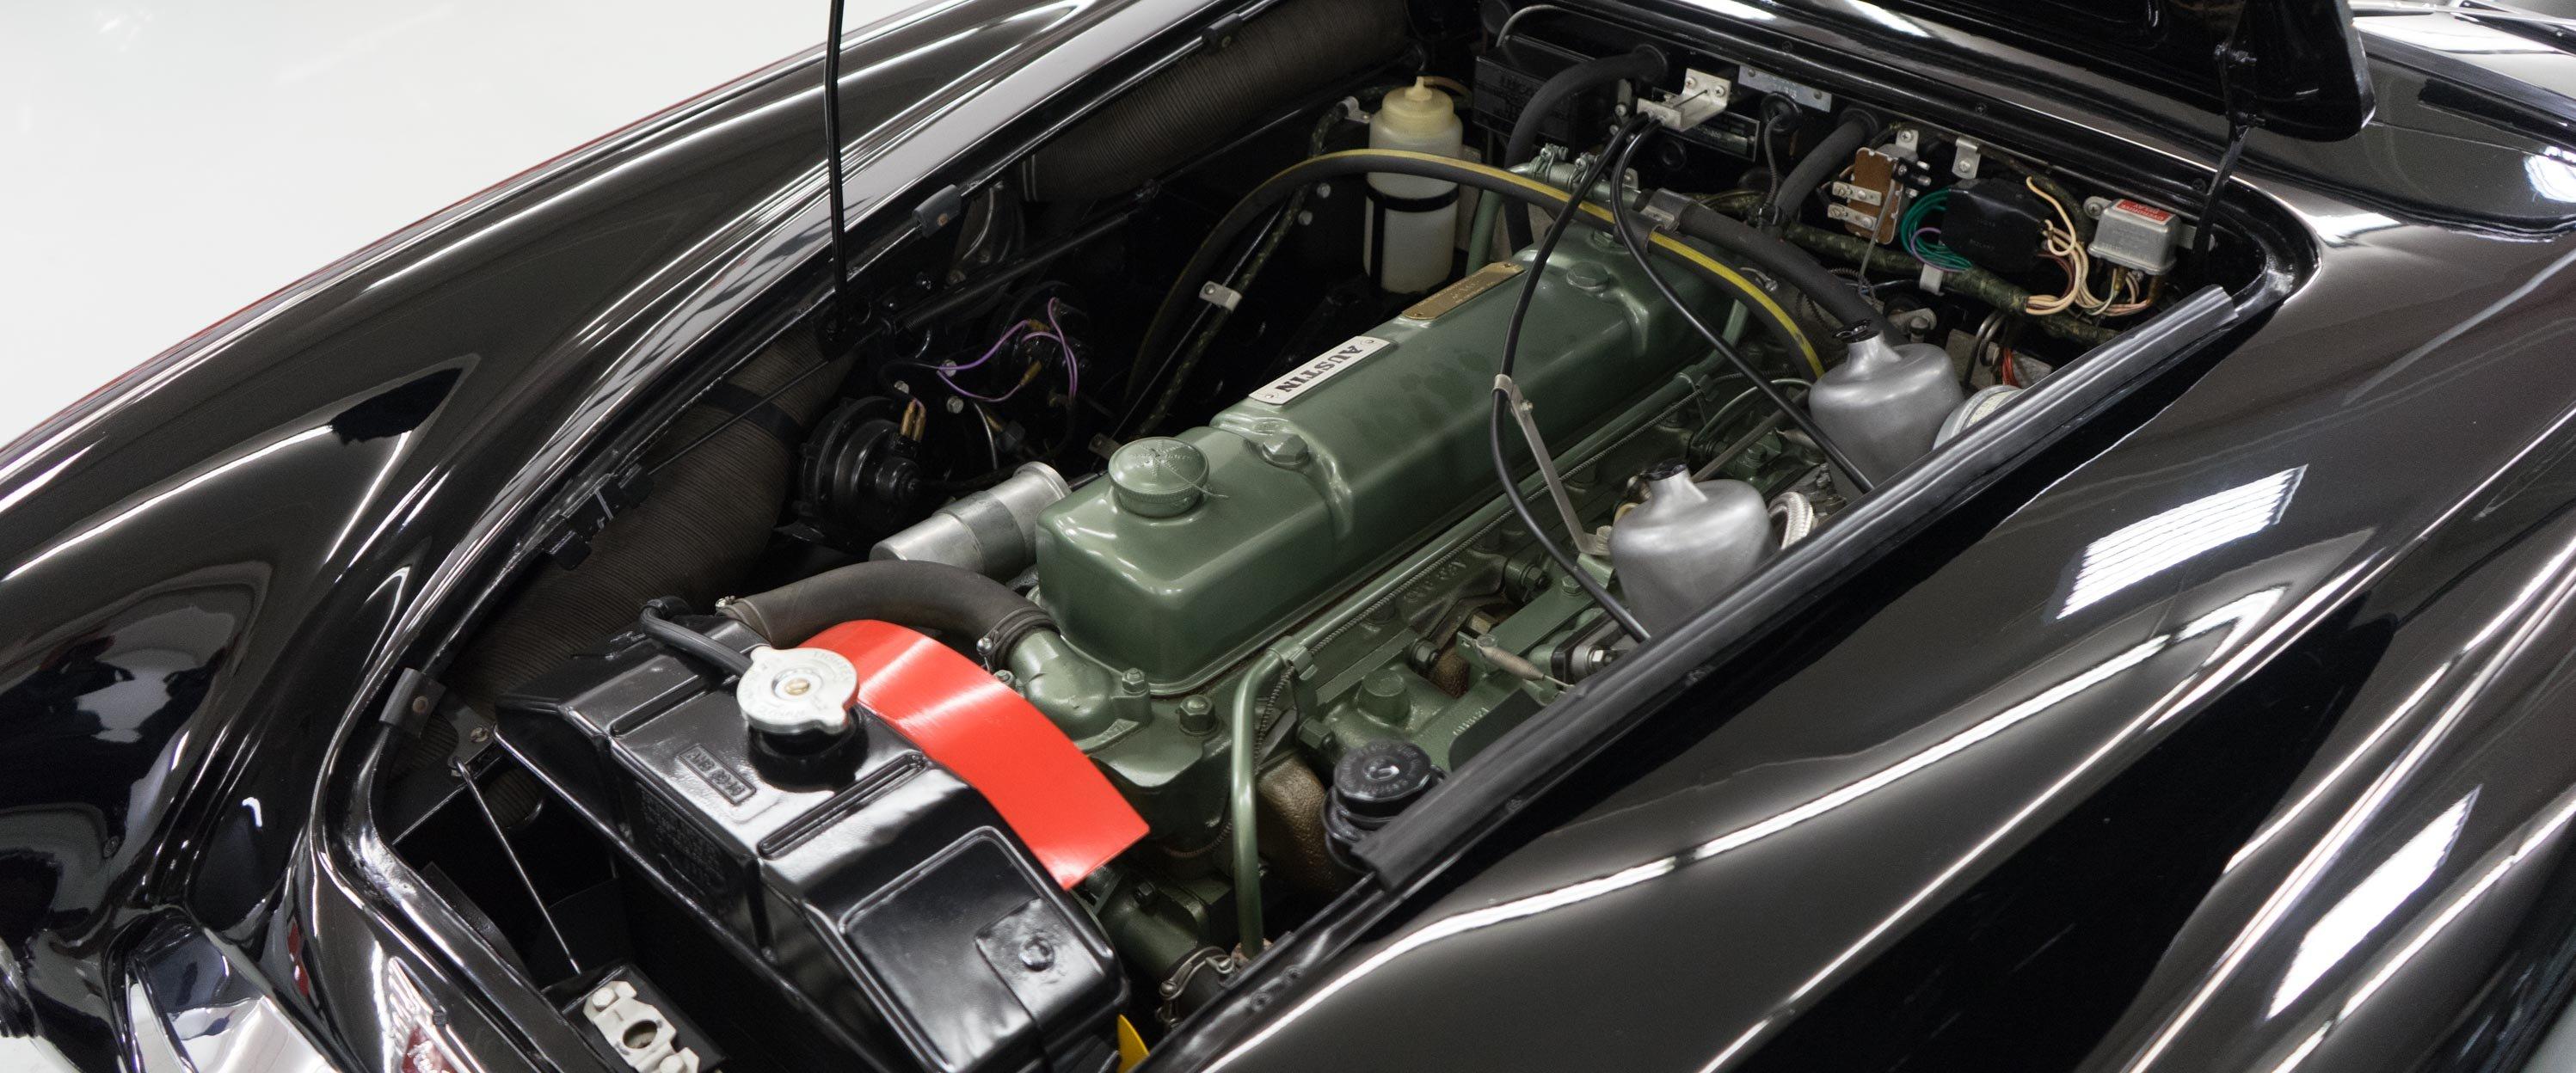 1964-Austin-Healey-3000-BJ8-Black-slideshow-013@2x